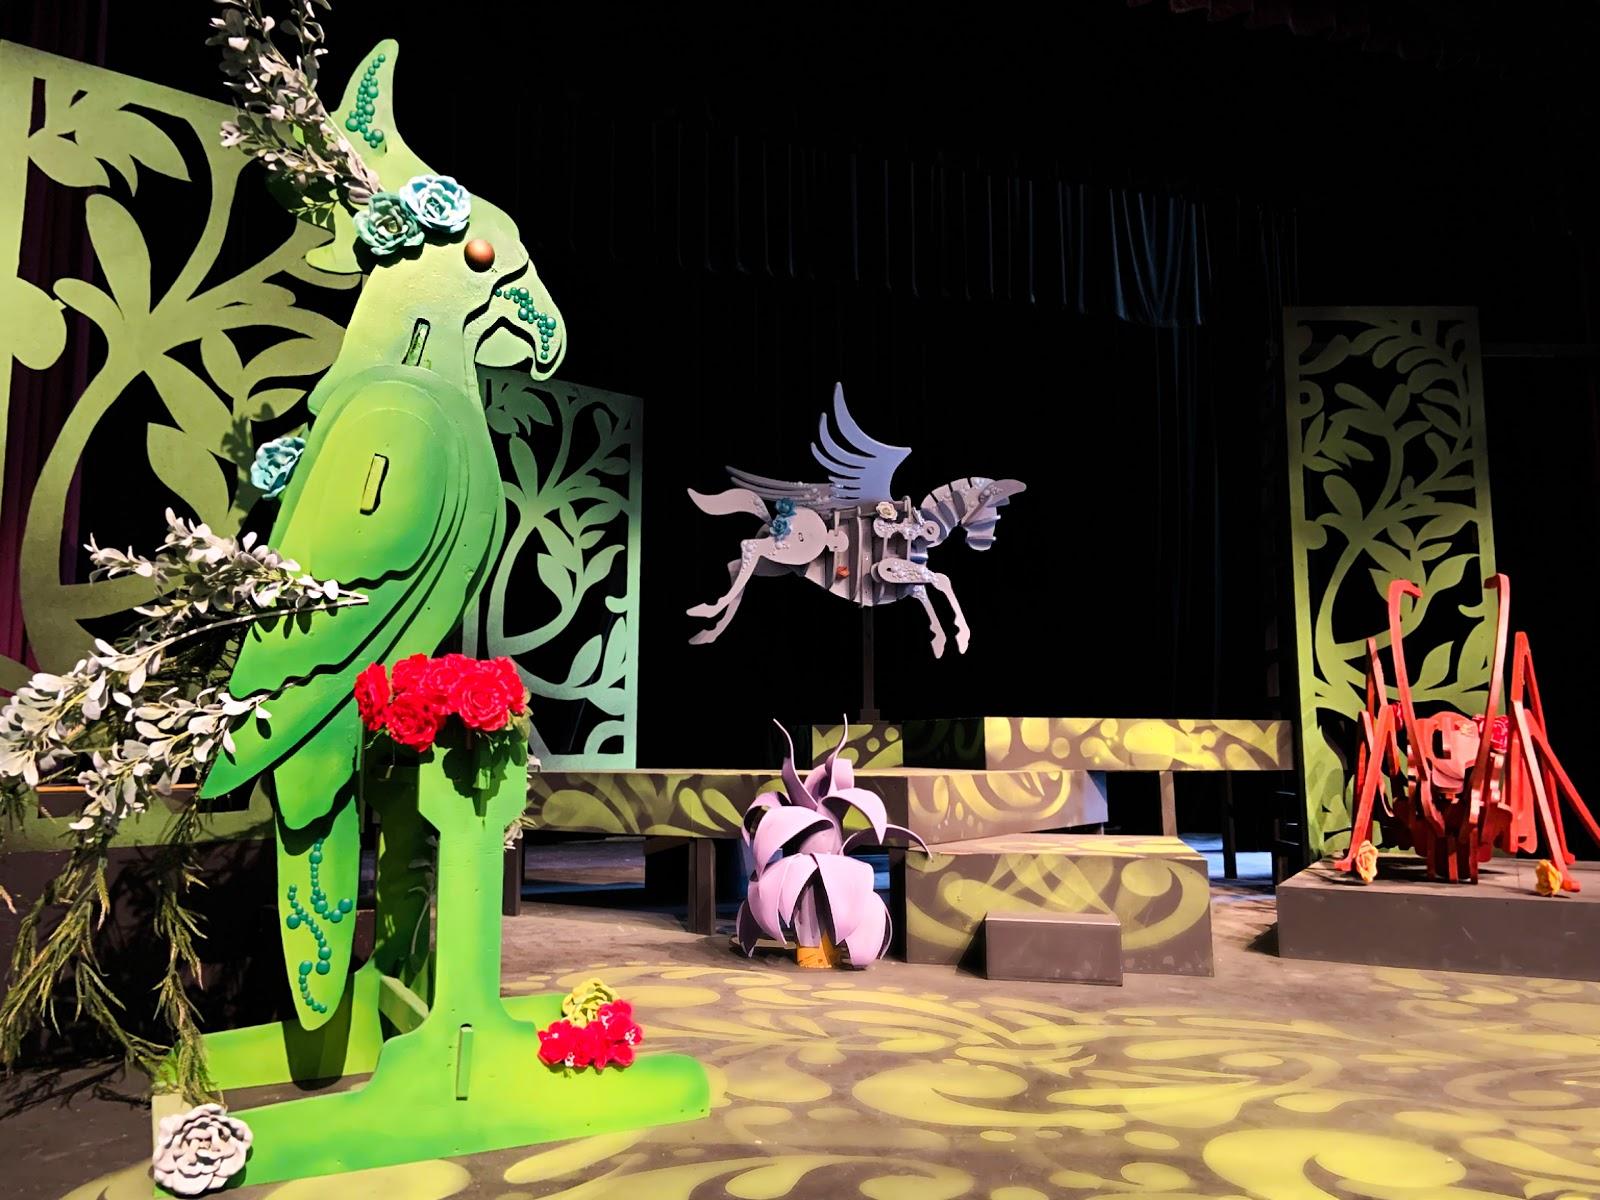 Kick-off Fiesta San Antonio with The Magical Piñata at The Magik Theatre!